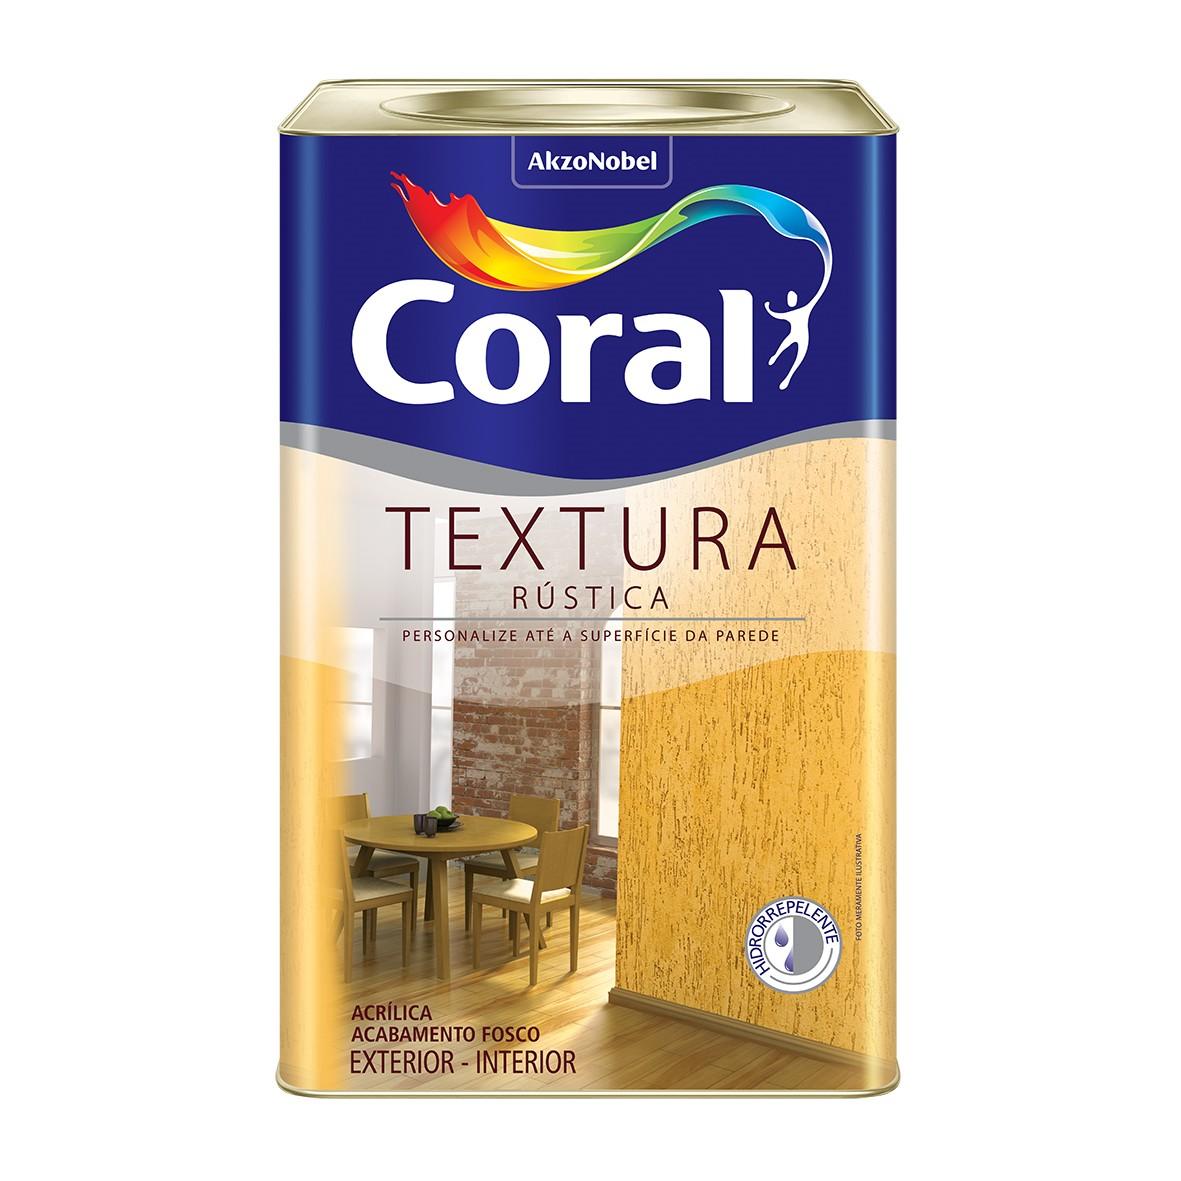 Textura Premium 330Kg - Branco Neve - Rustica - Coral